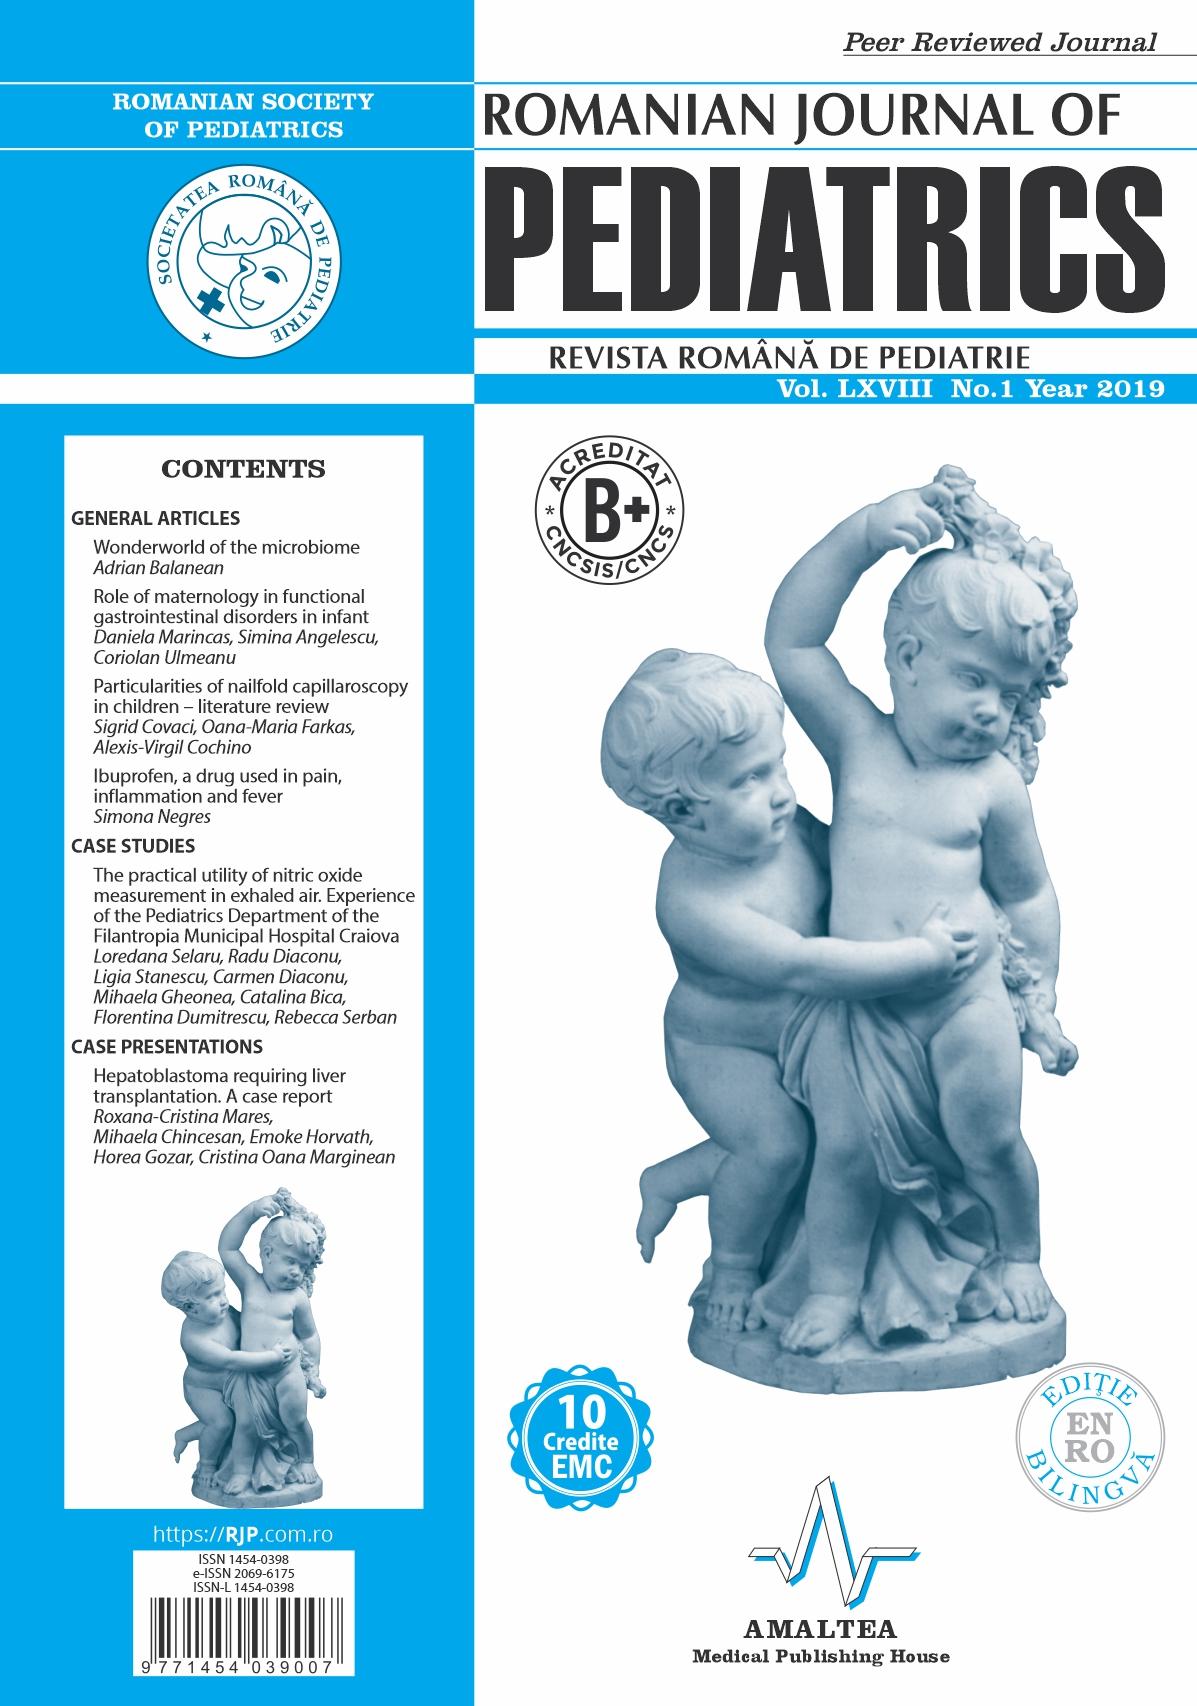 Romanian Journal of Pediatrics | Volume LXVIII, No. 1, Year 2019